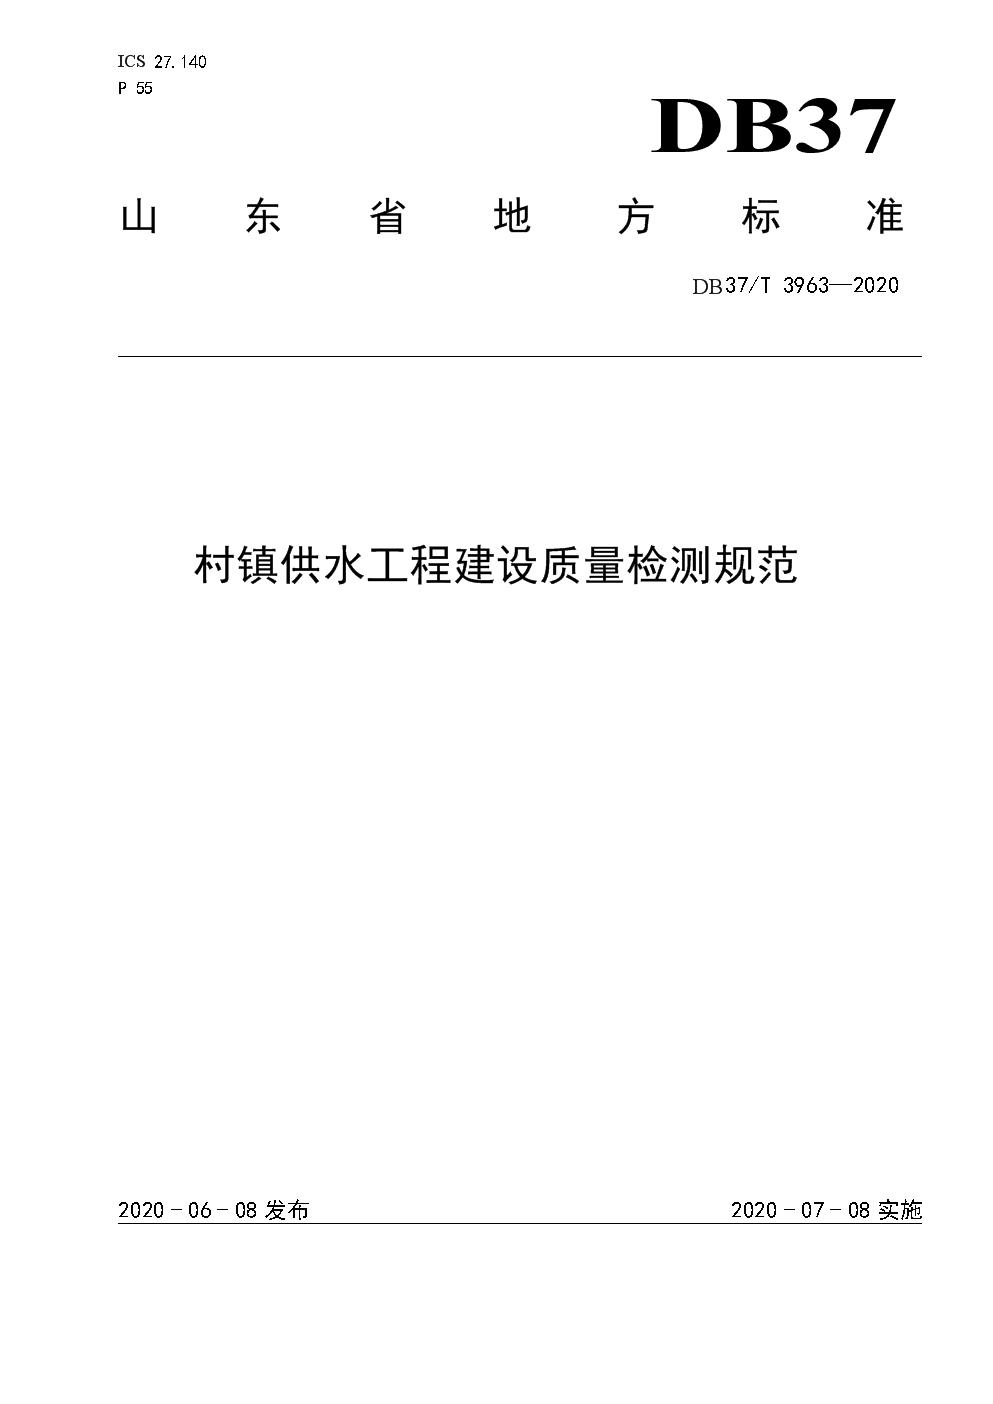 DB37_T 3963—2020村鎮供水工程建設質量檢測規范.docx